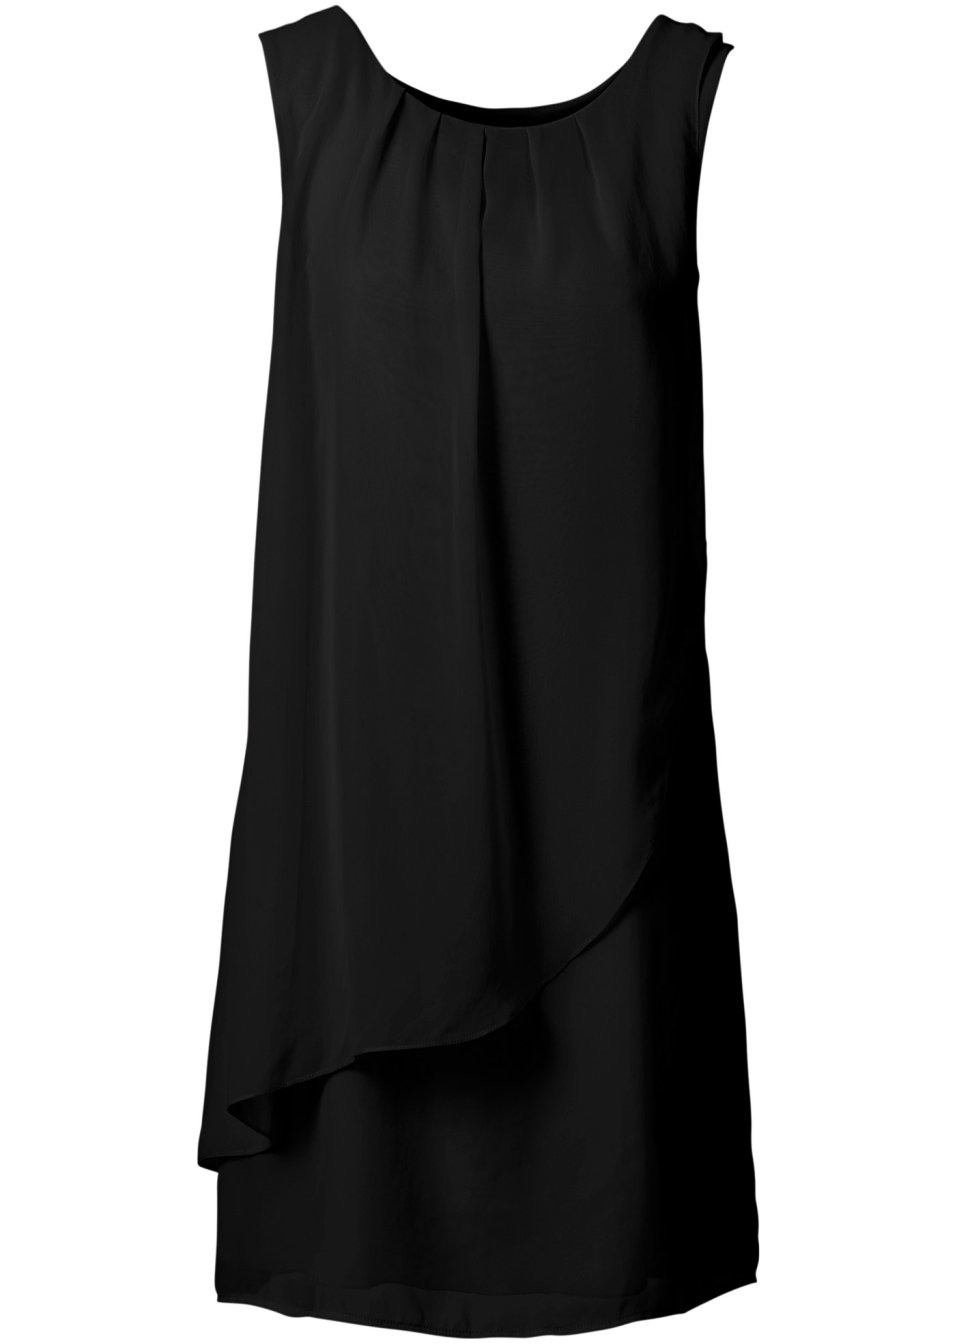 13 Elegant Schwarzes Kleid Design10 Cool Schwarzes Kleid Spezialgebiet